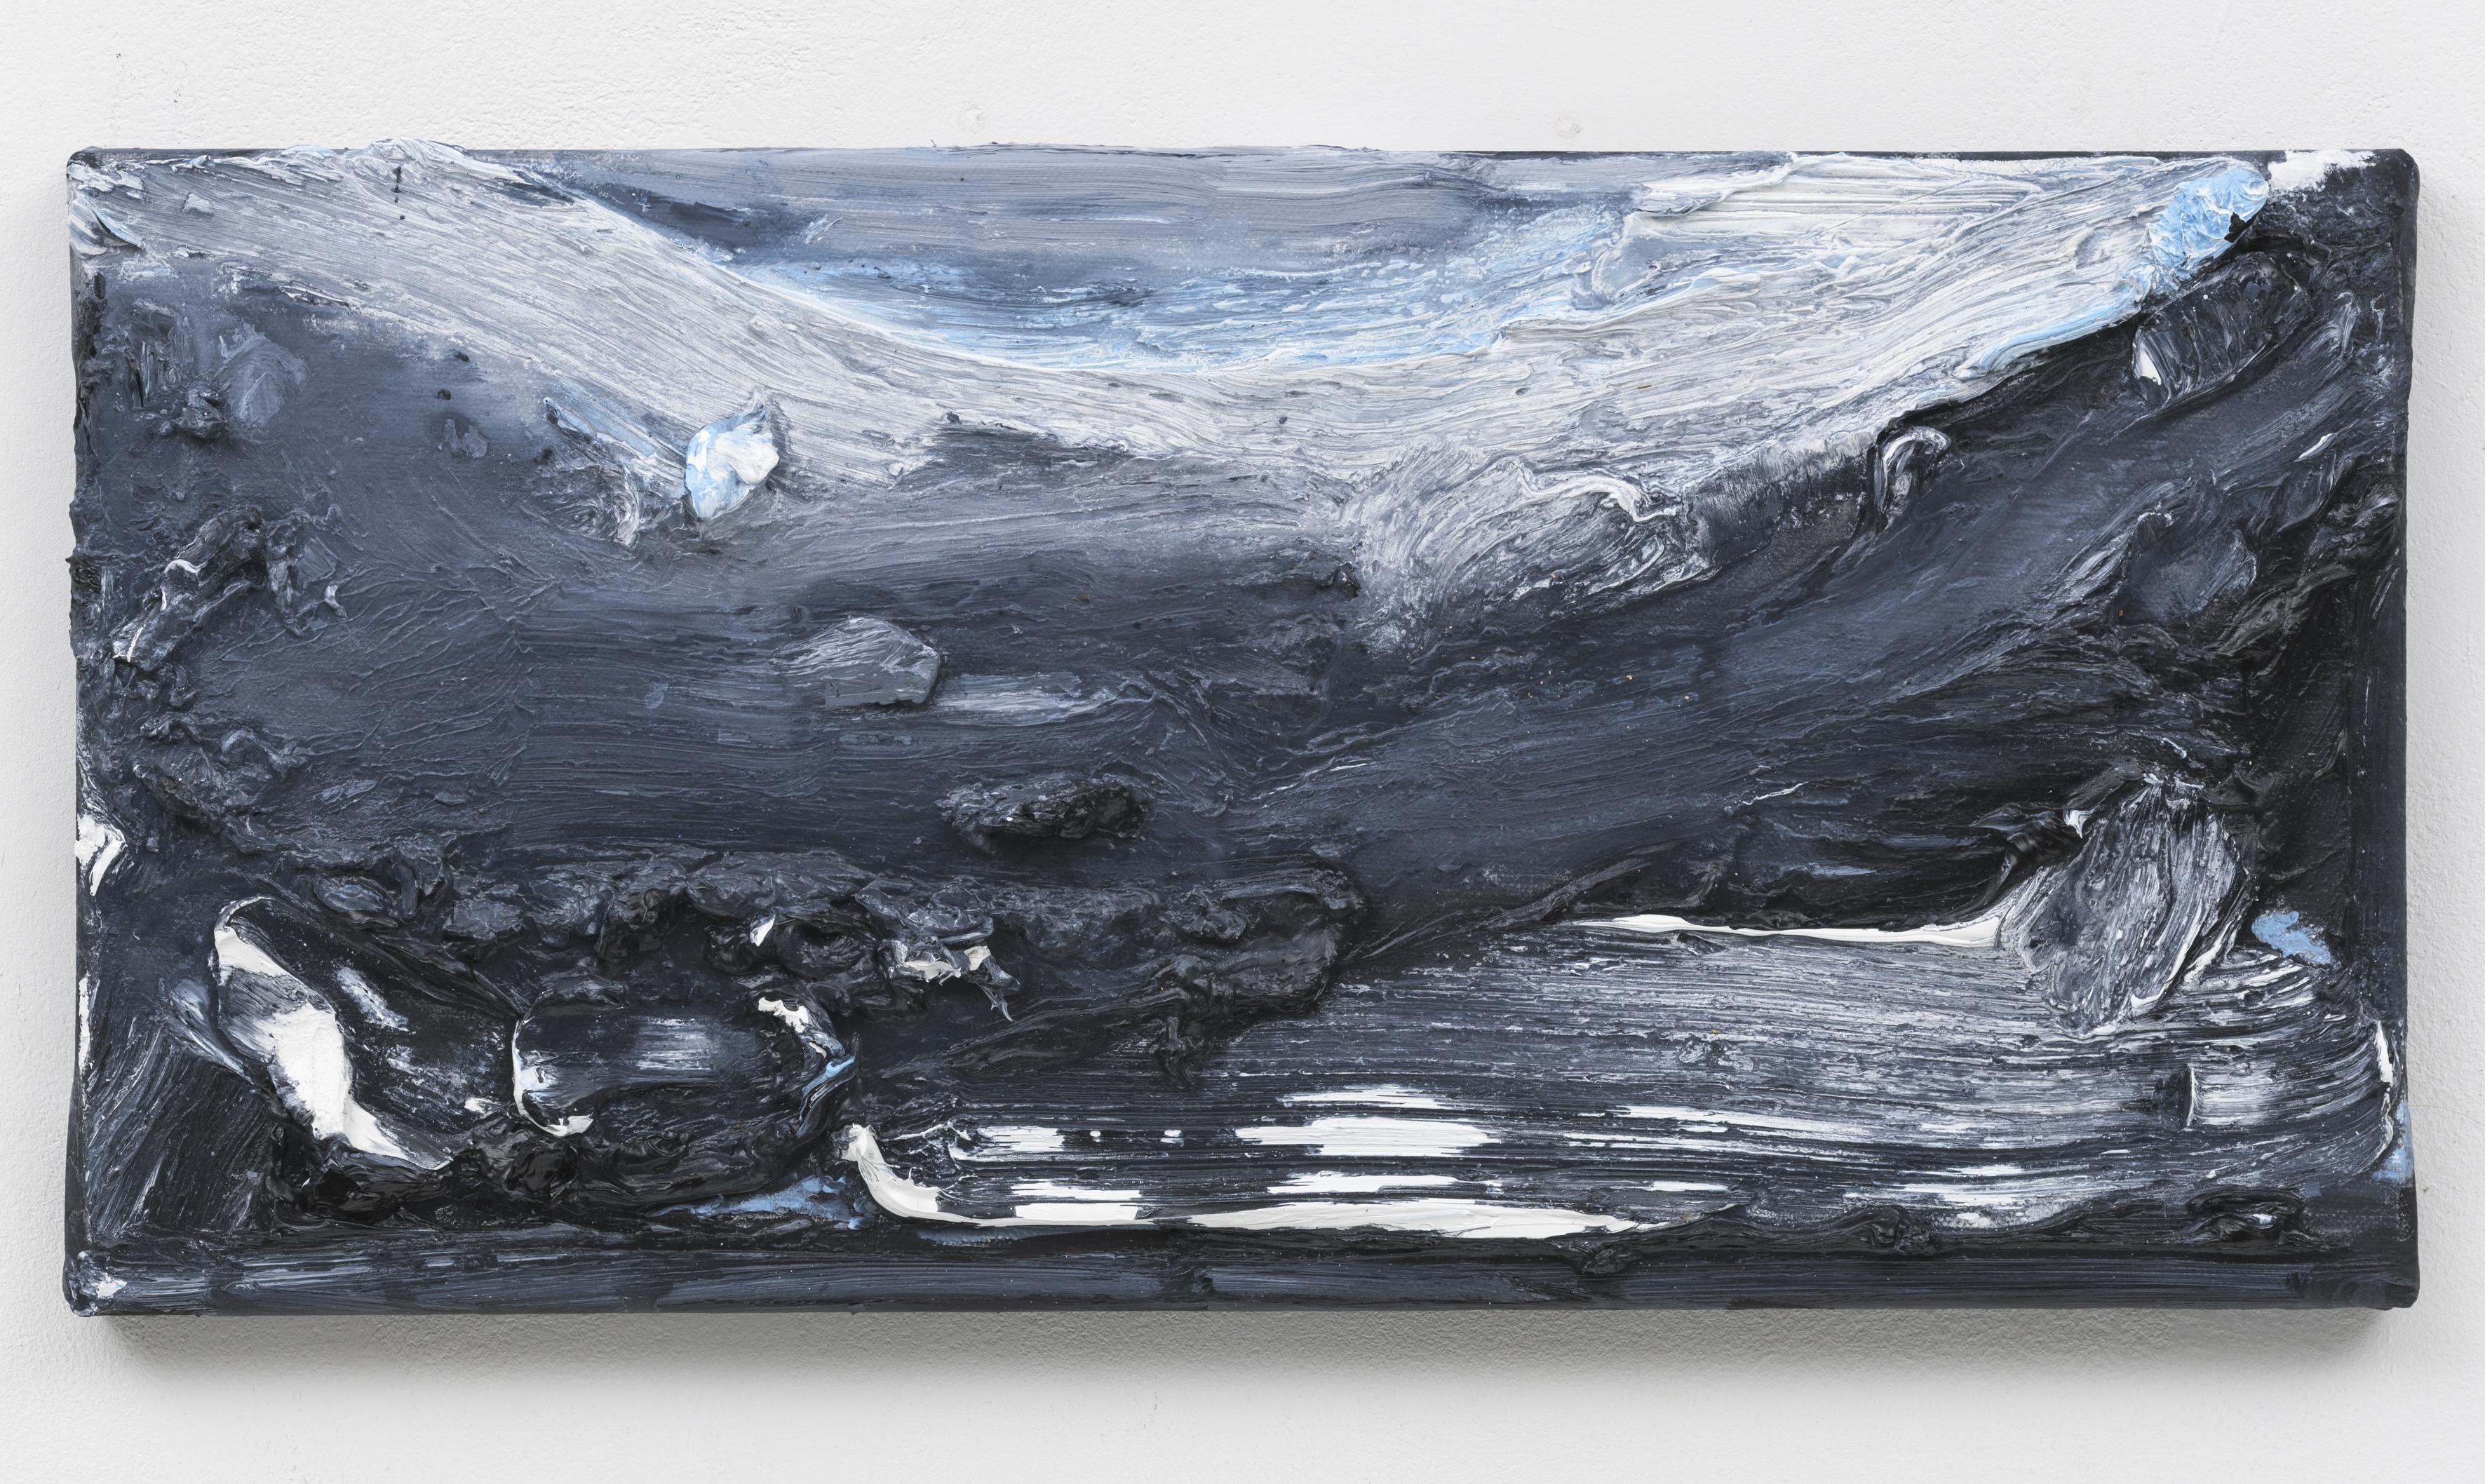 """Wanderung IX, Berlin Suite"" 20 x 40 cm. oil on linen 2018 (Special Edition, Berlin)"